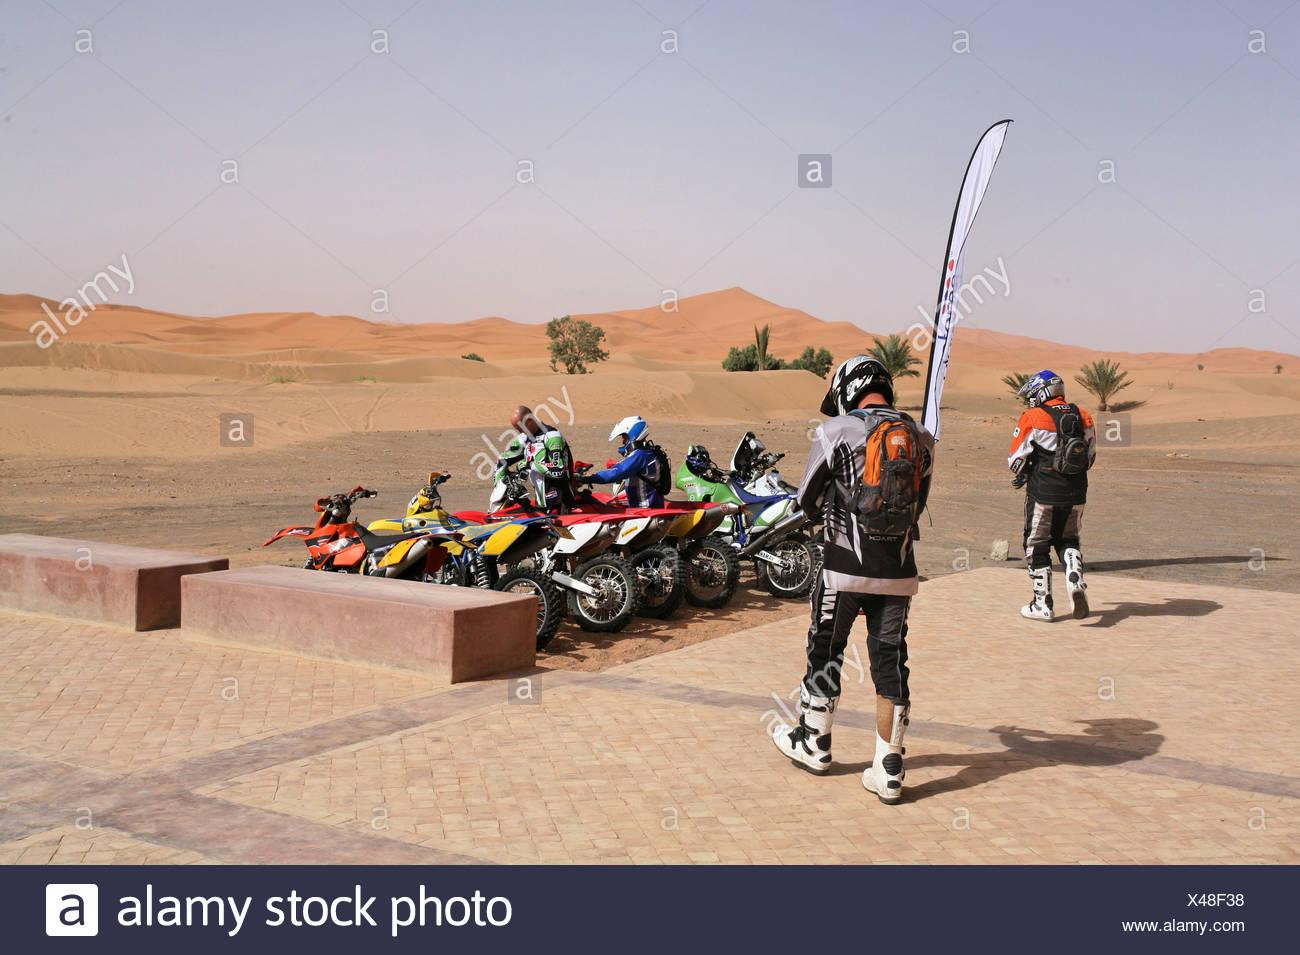 Motor sport moto cross Enduro motos motos aventure Motrrad desert Sahara Merzouga Maroc Sud Photo Stock